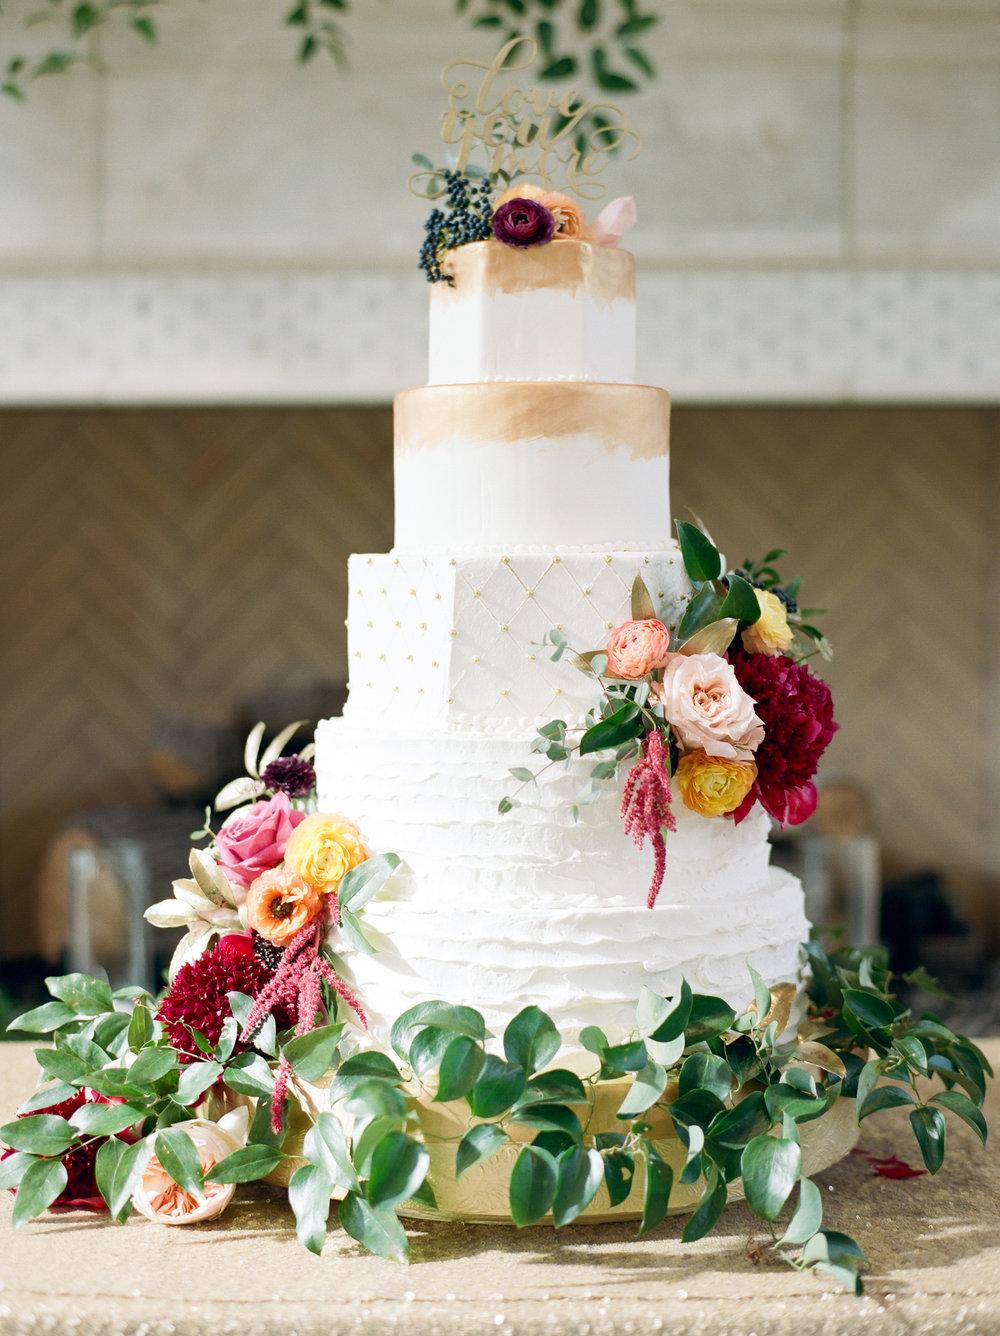 Houston-Wedding-Photographer-Fine-Art-Film-Destination-Style-Me-Pretty-Austin-Dallas-New-Orleans-Dana-Fernandez-Photography-The Woodlands-Country-Club-26.jpg